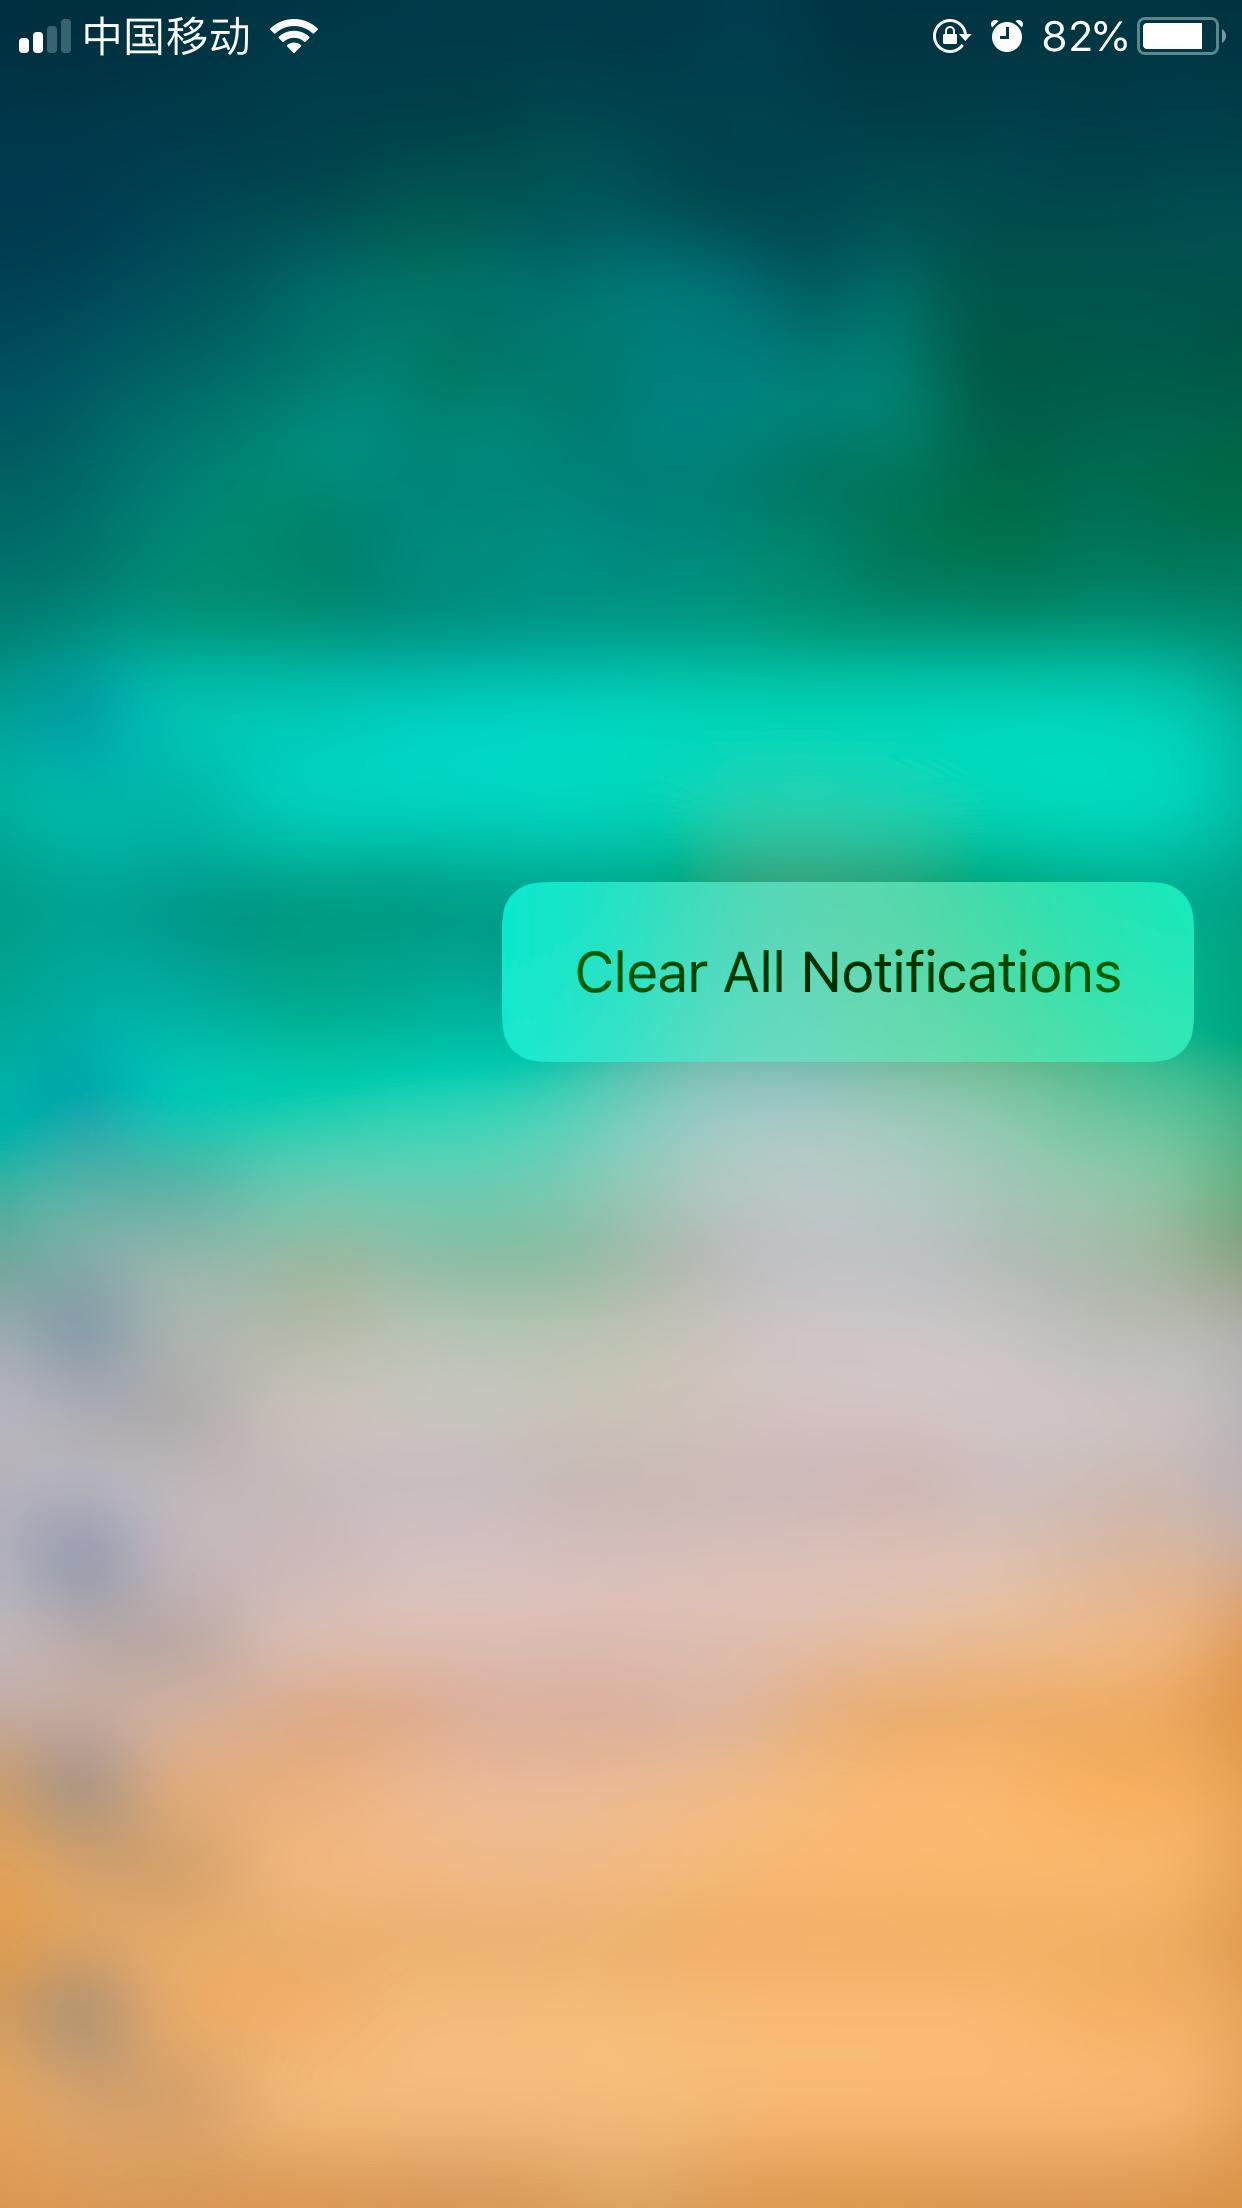 20180526-iOS-Clear-All-Push-notification.jpeg